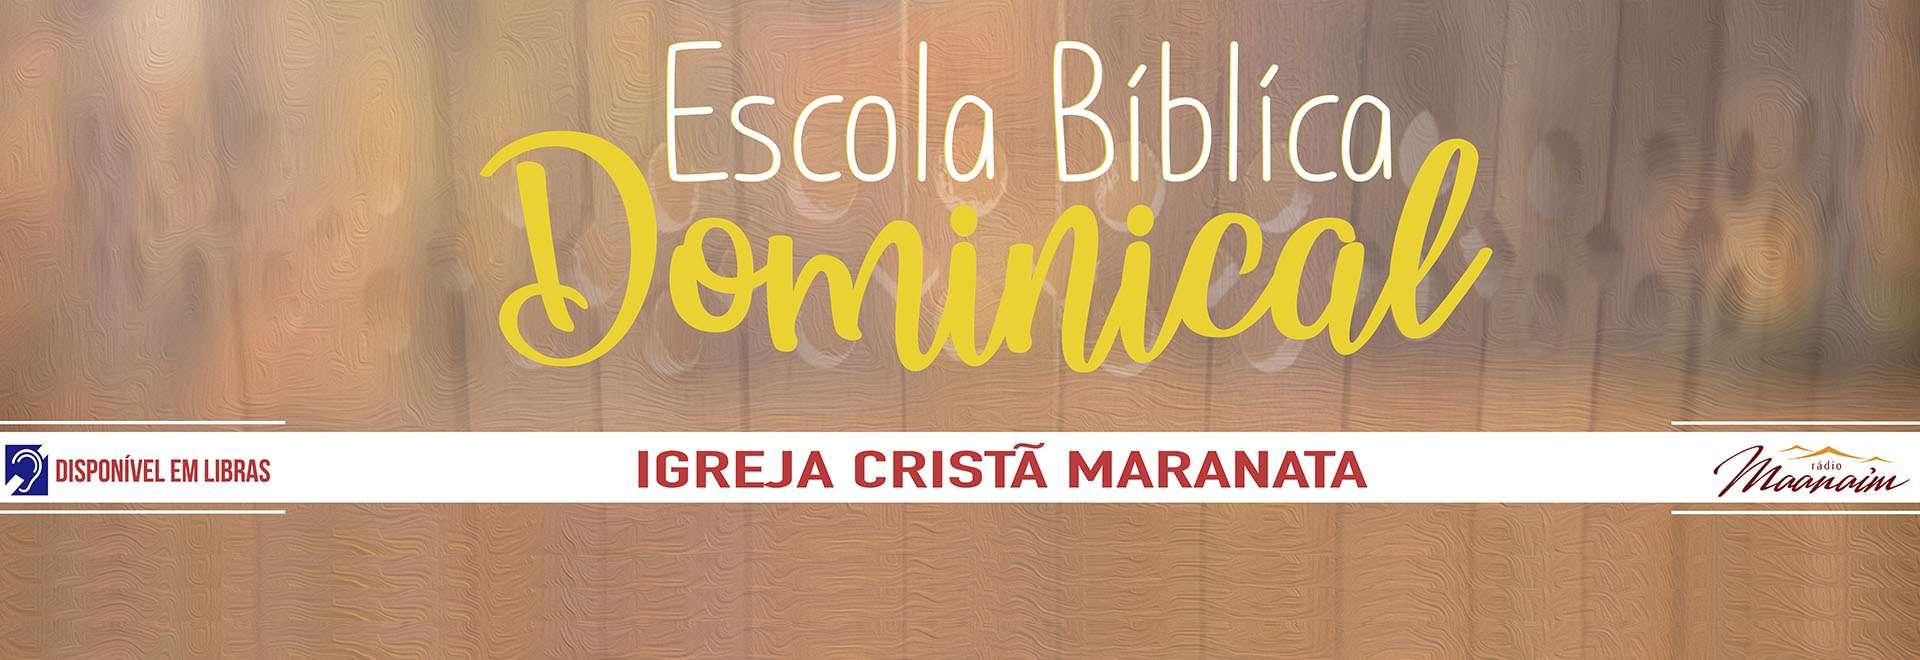 Participações da EBD da Igreja Cristã Maranata - 28/03/2021